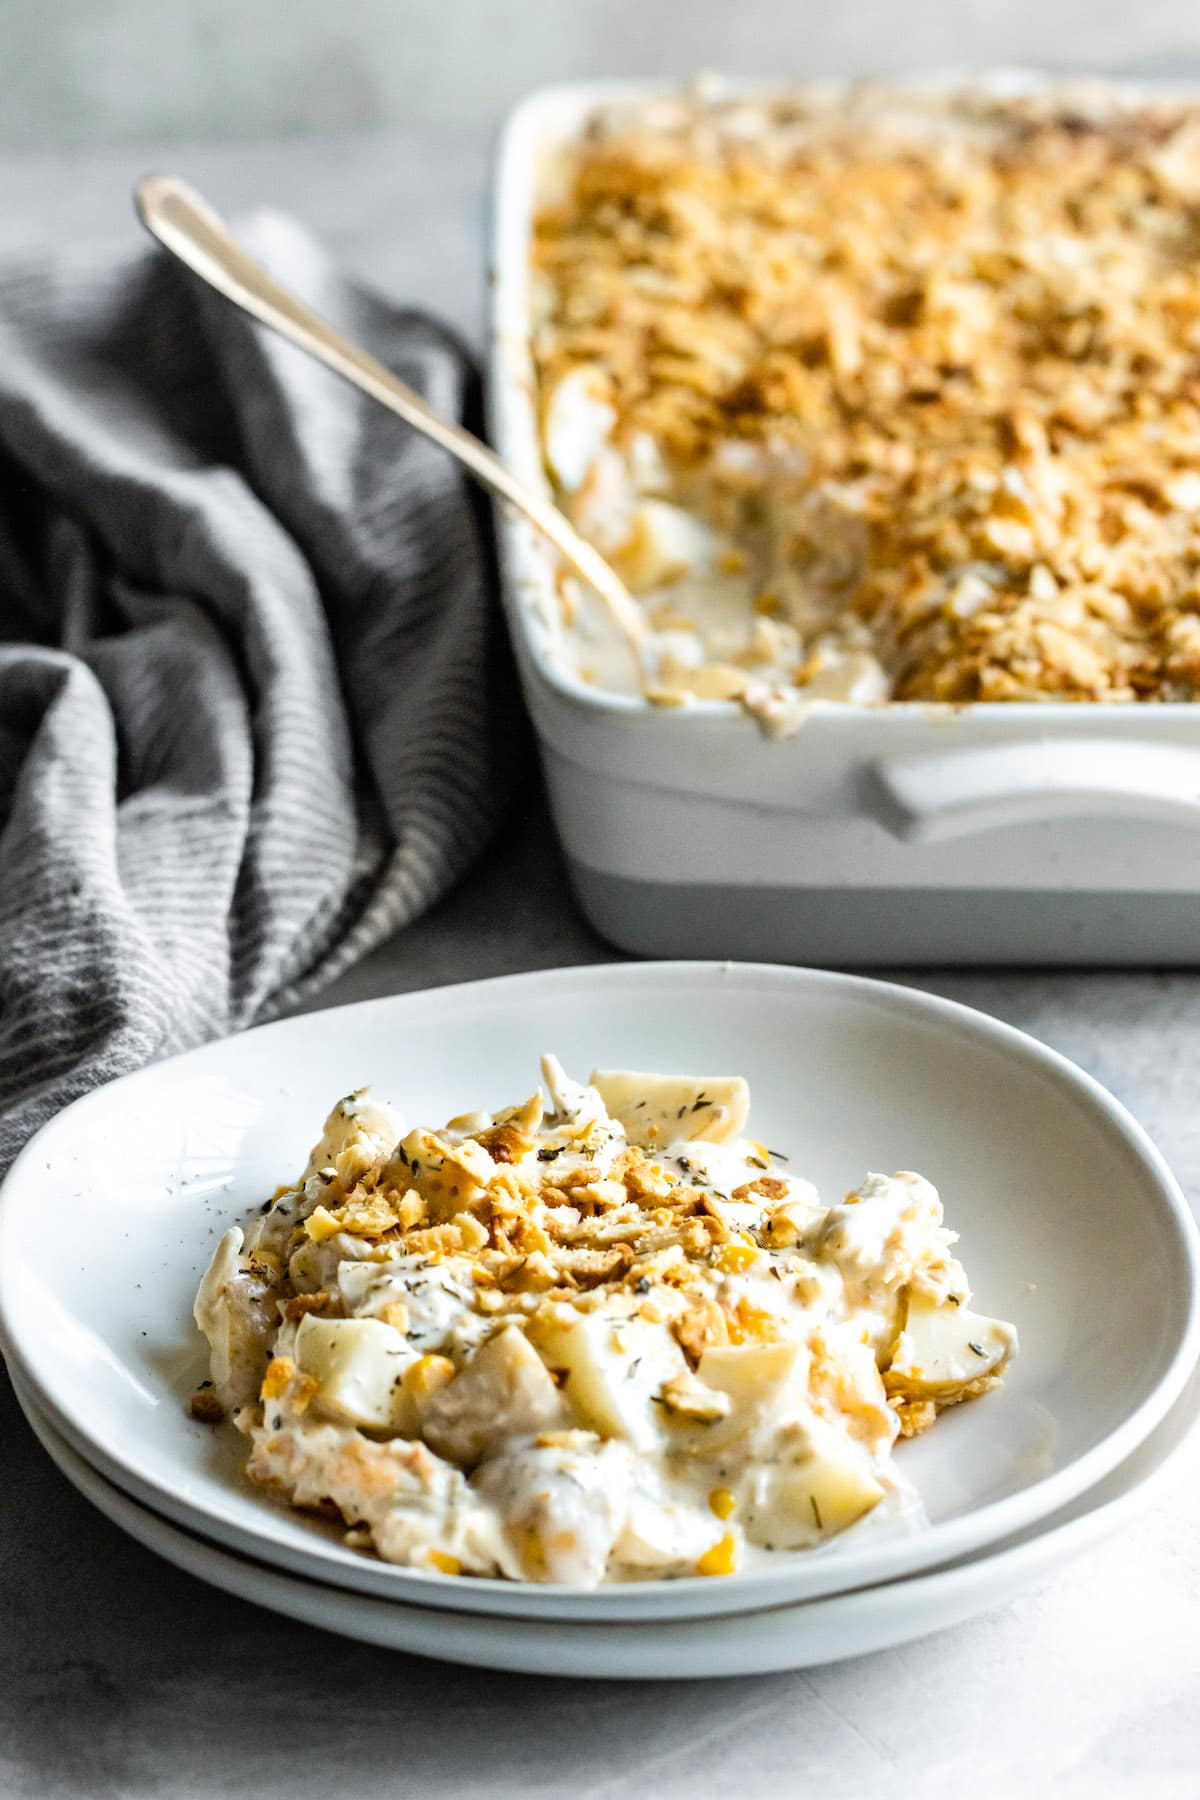 Plate of cheesy chicken casserole.